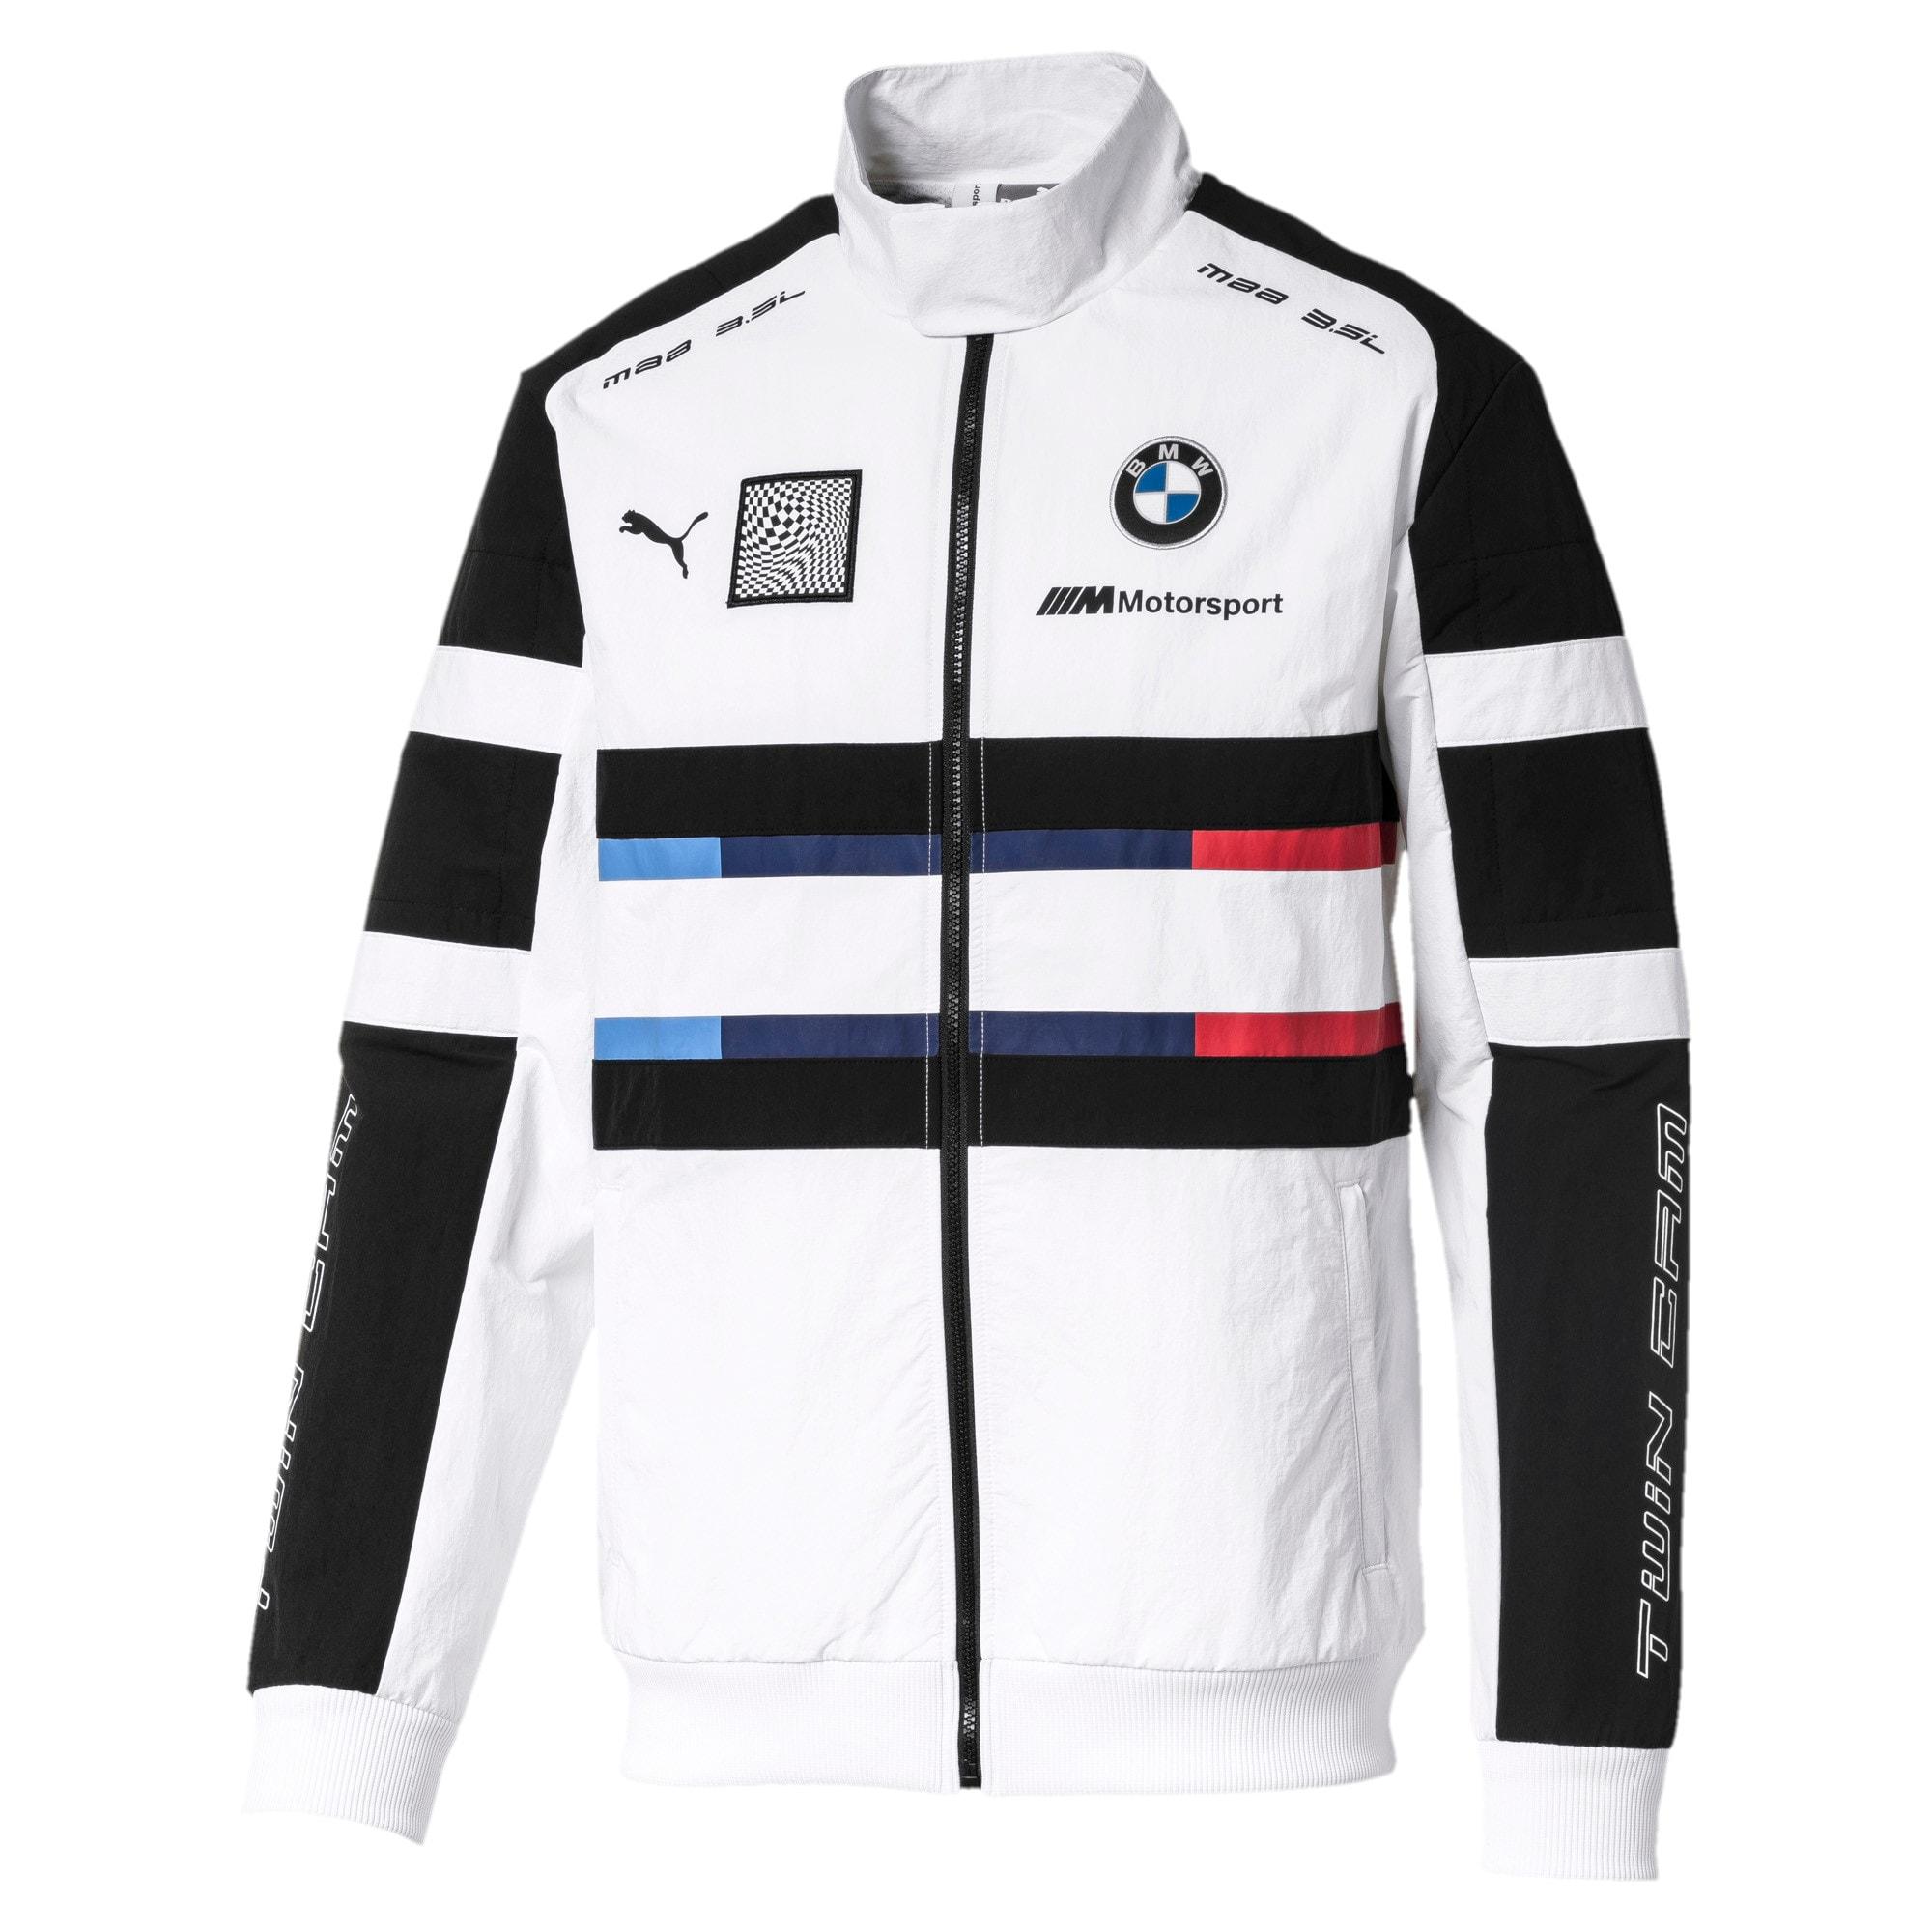 Thumbnail 1 of Geweven BMW Motorsport street-jack voor heren, Puma White, medium